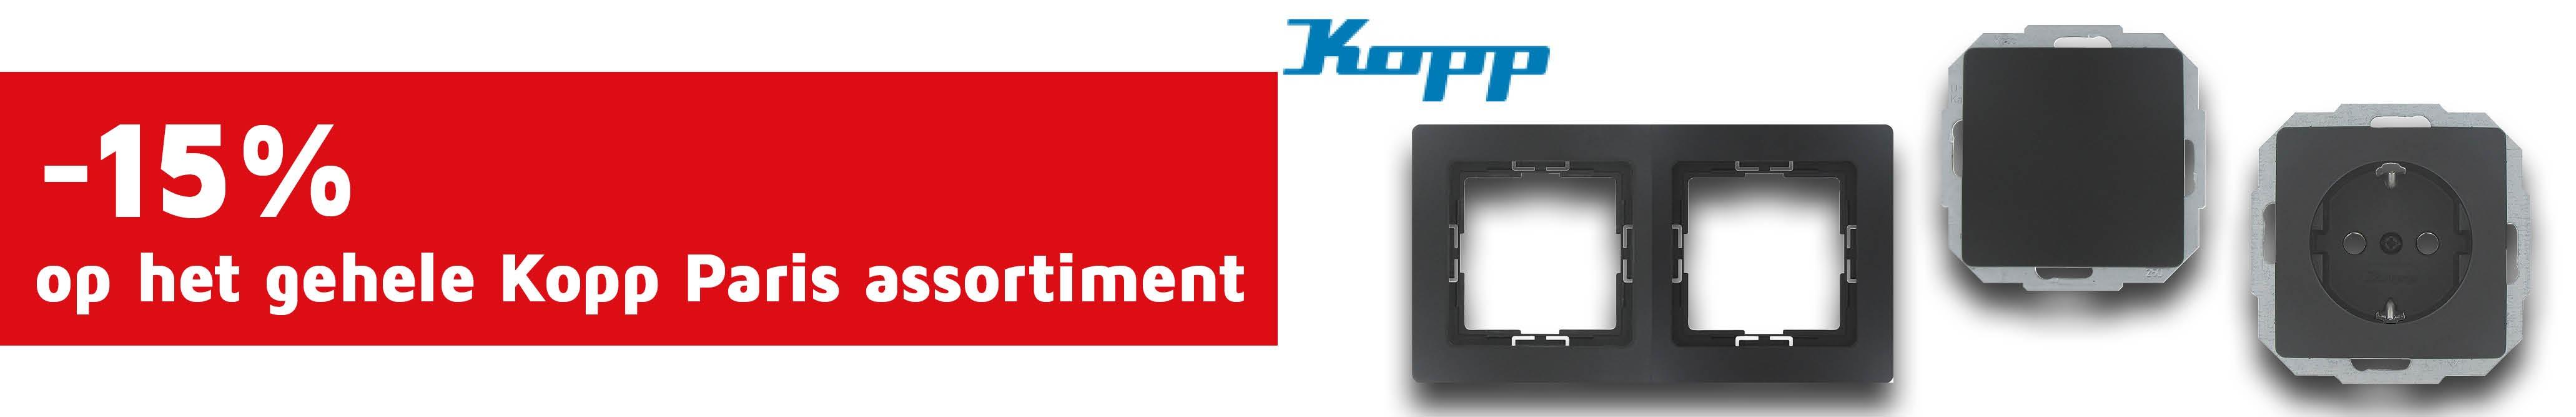 DPT100_990x160   Kopp paris deal - Elektra #1-1